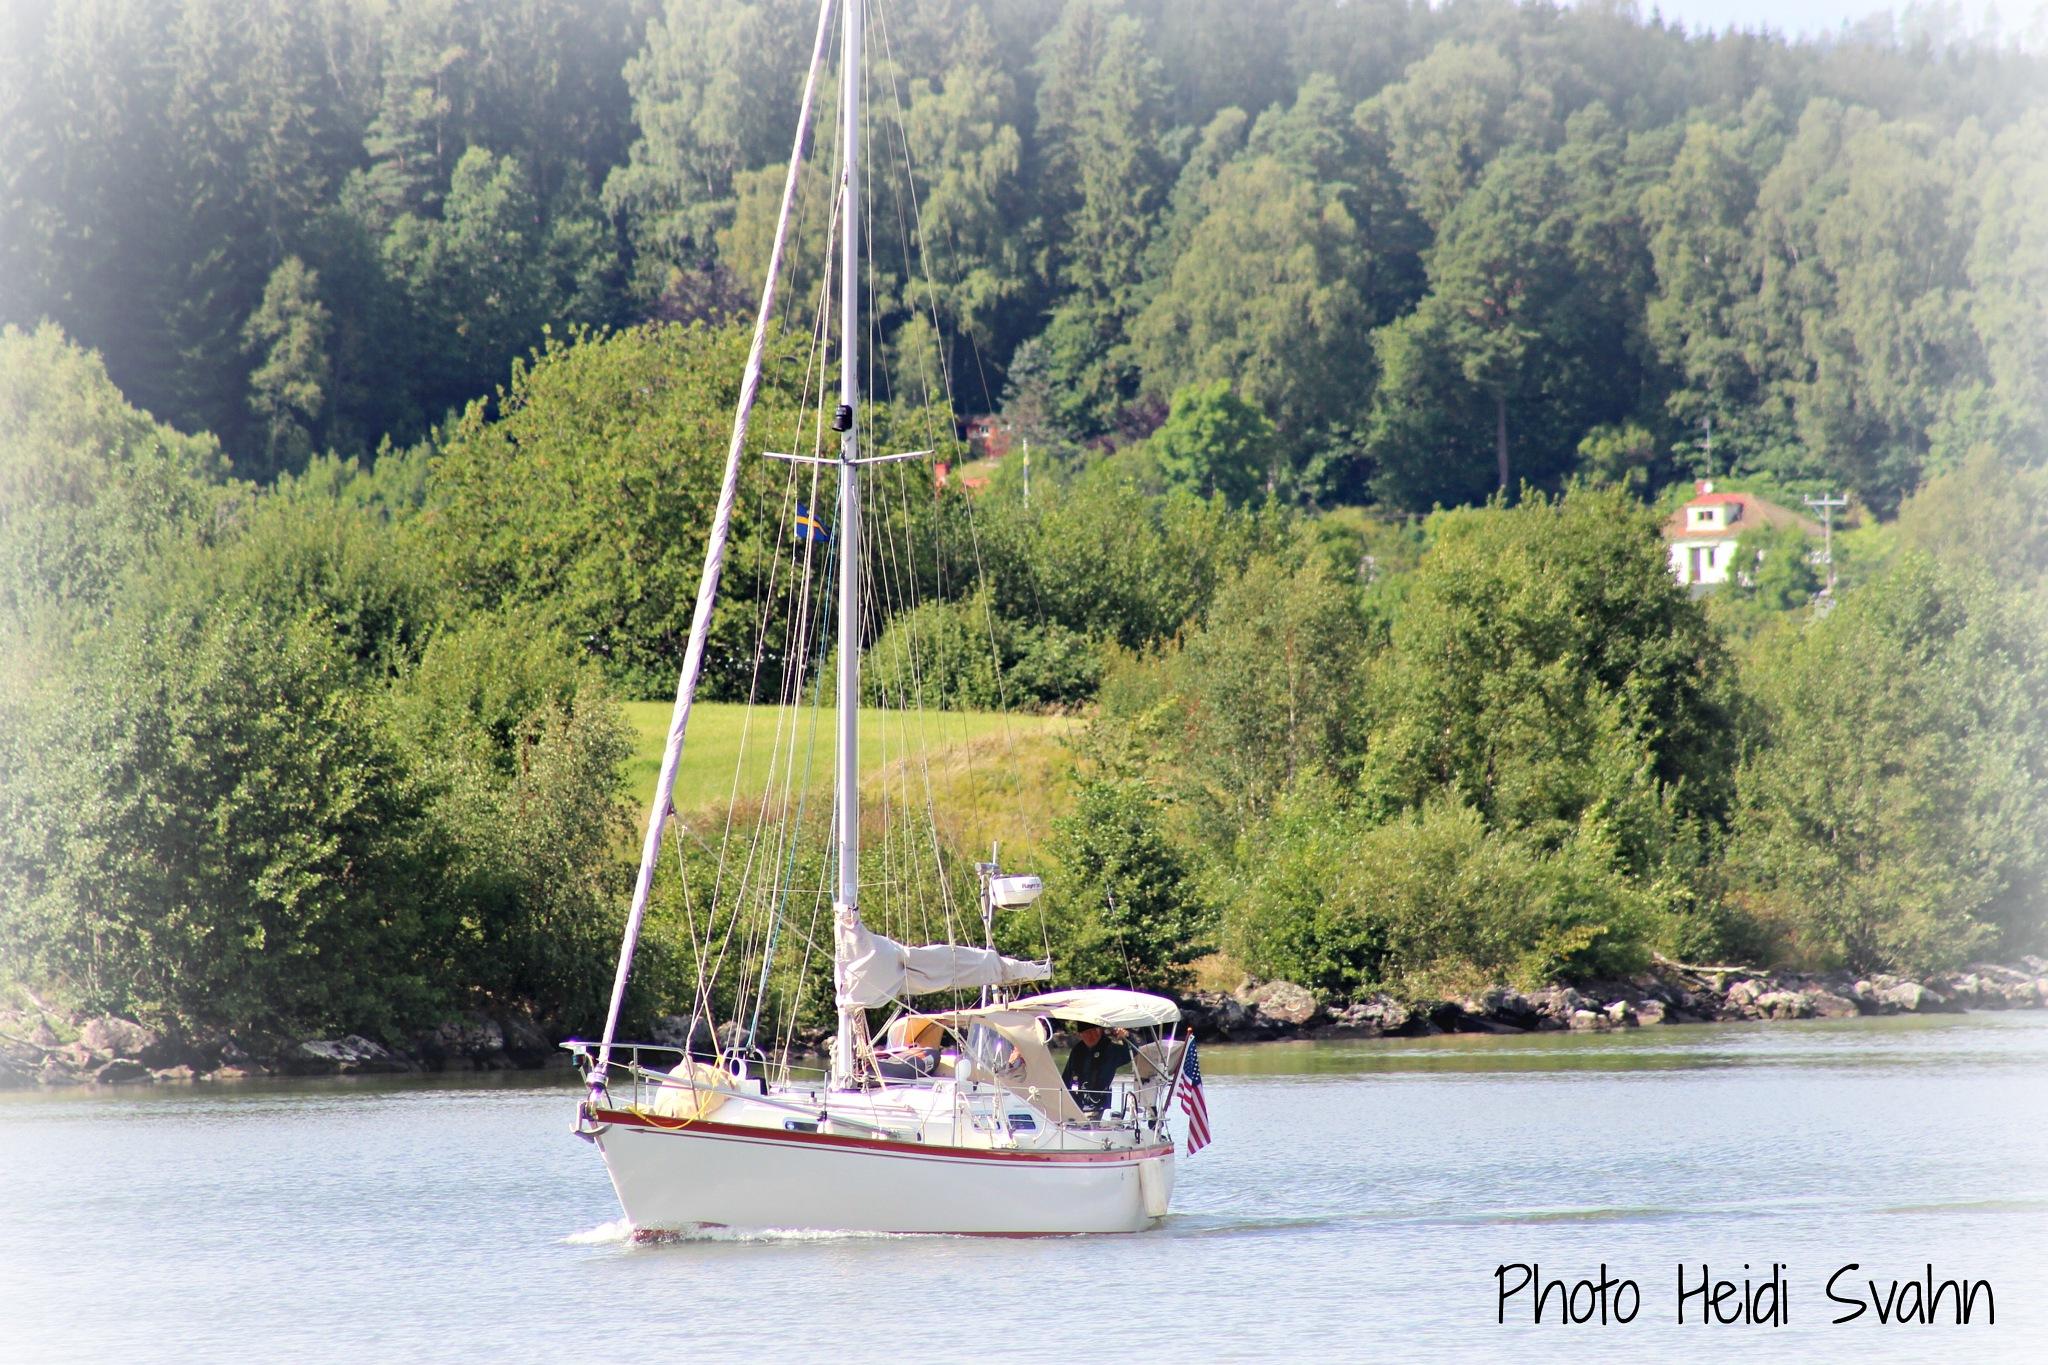 Sailing. by heidi.svahn1